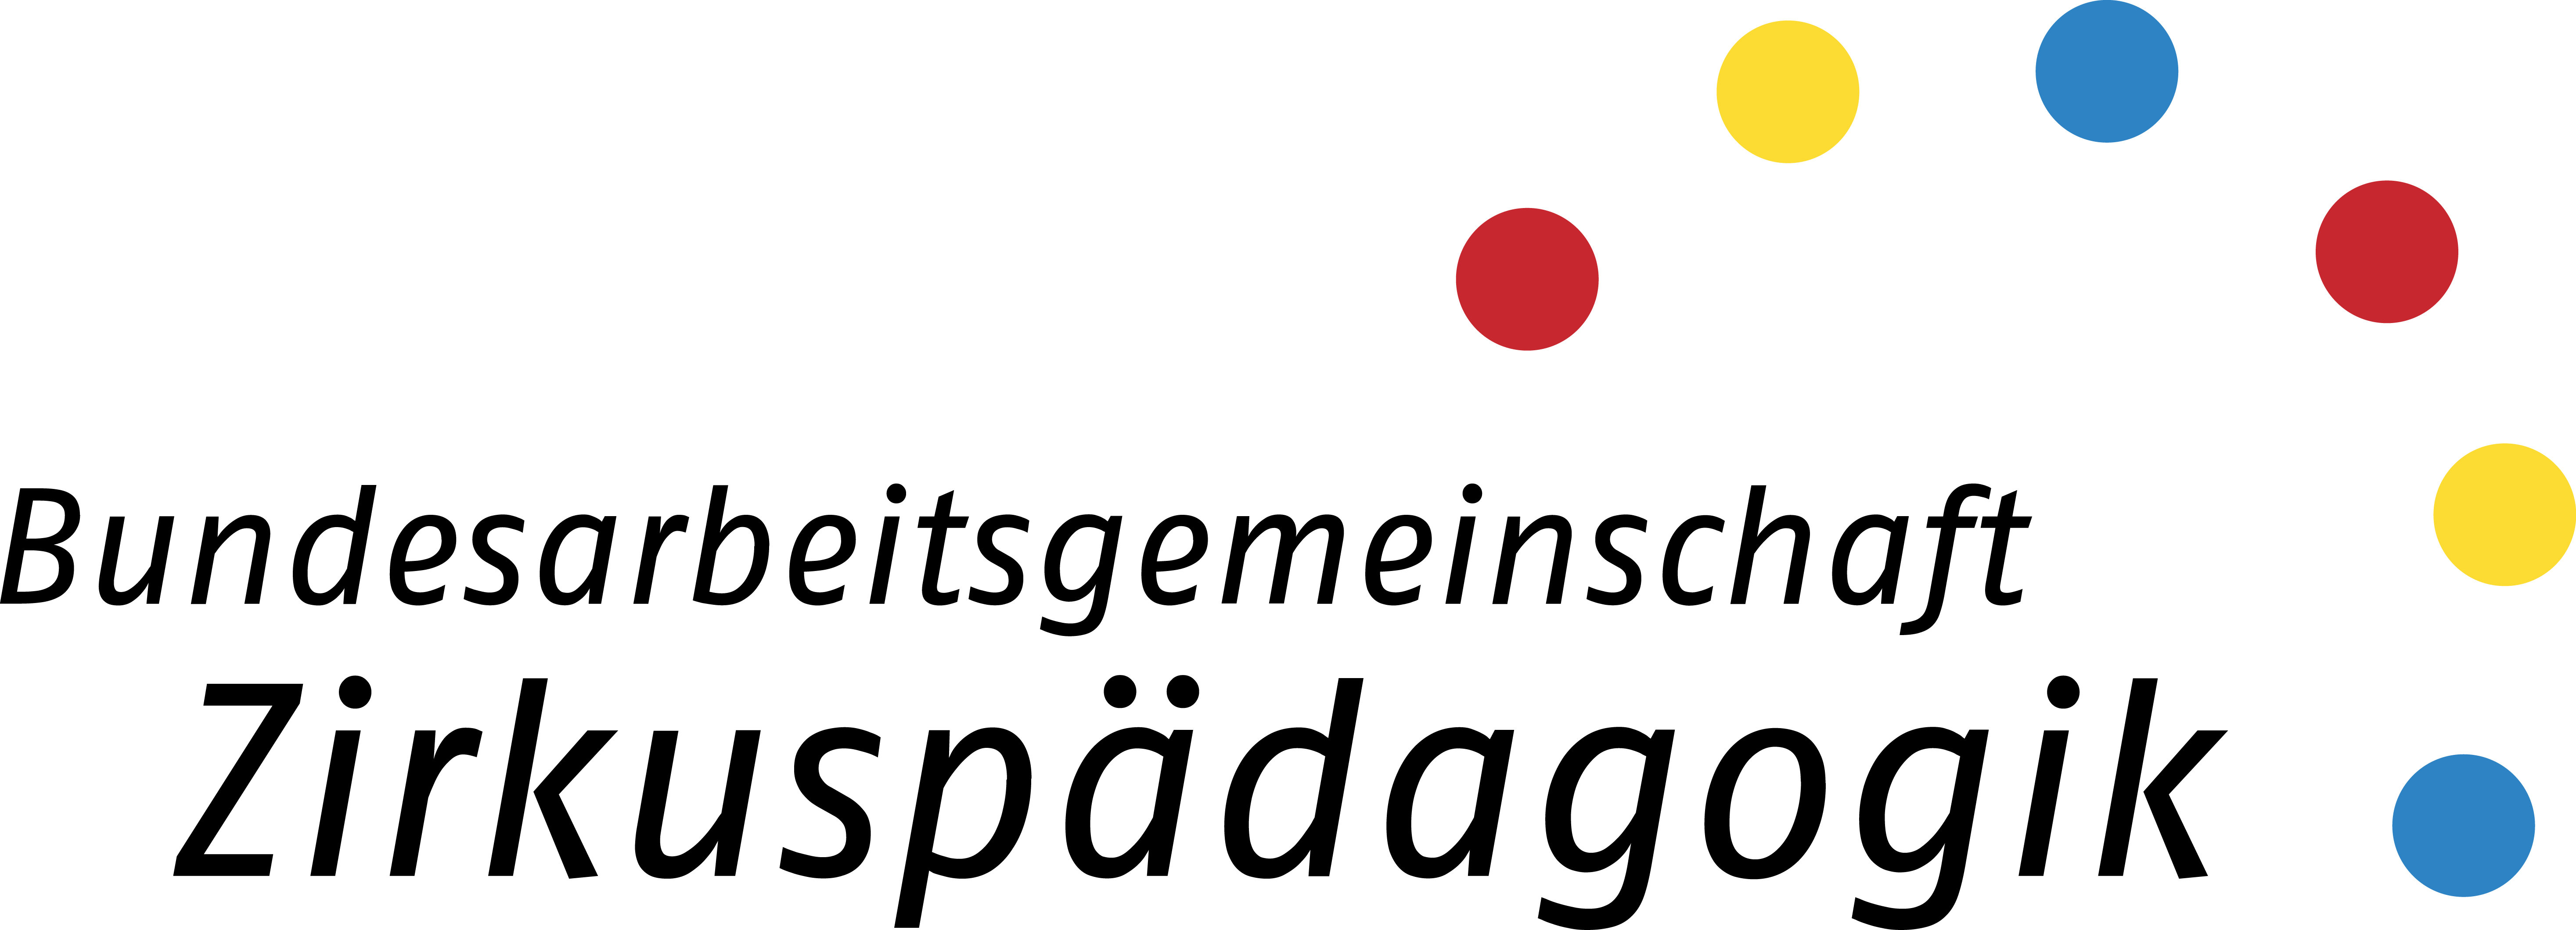 Die Bundesarbeitsgemeinschaft Zirkuspädagogik e.V